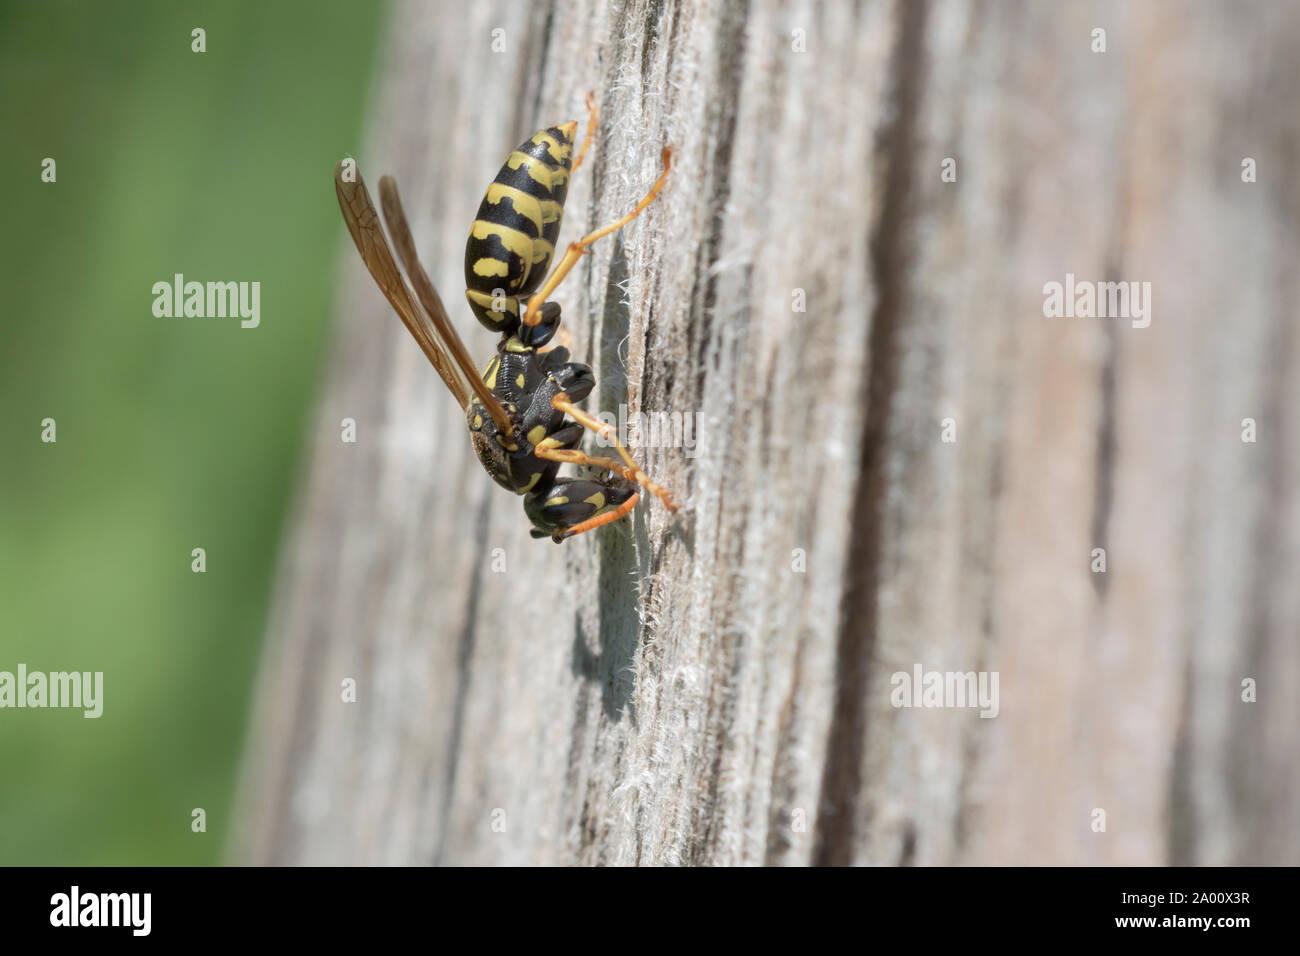 European paper wasp, Natural park Munden, Lower Saxony, Germany (Polistes dominula), M Stock Photo